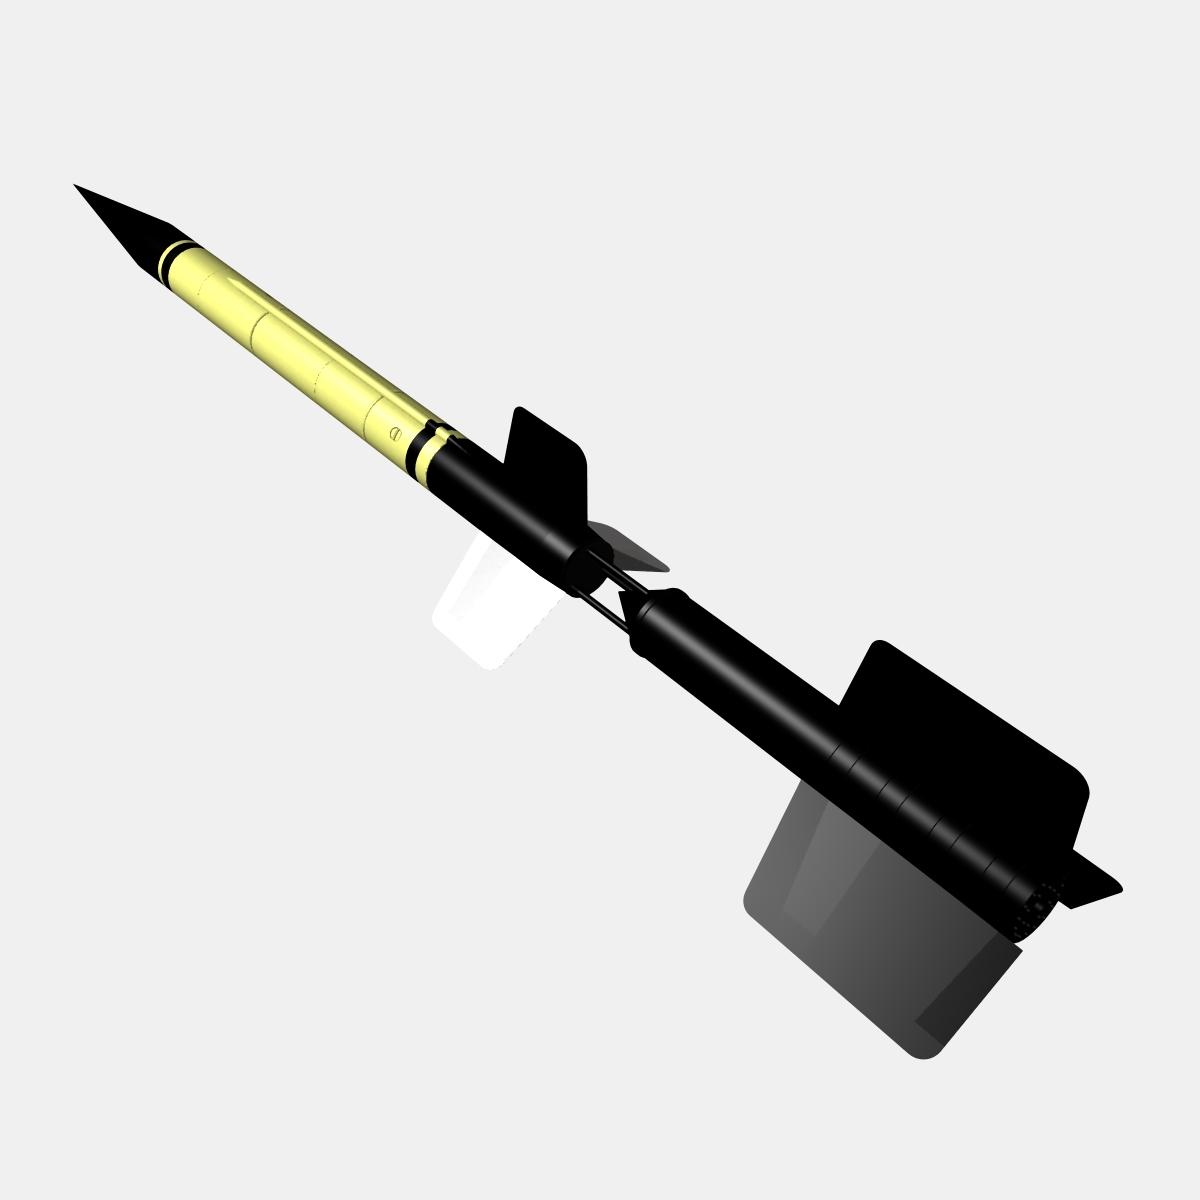 us wac corporal rocket 3d model 3ds dxf x cod scn obj 149606